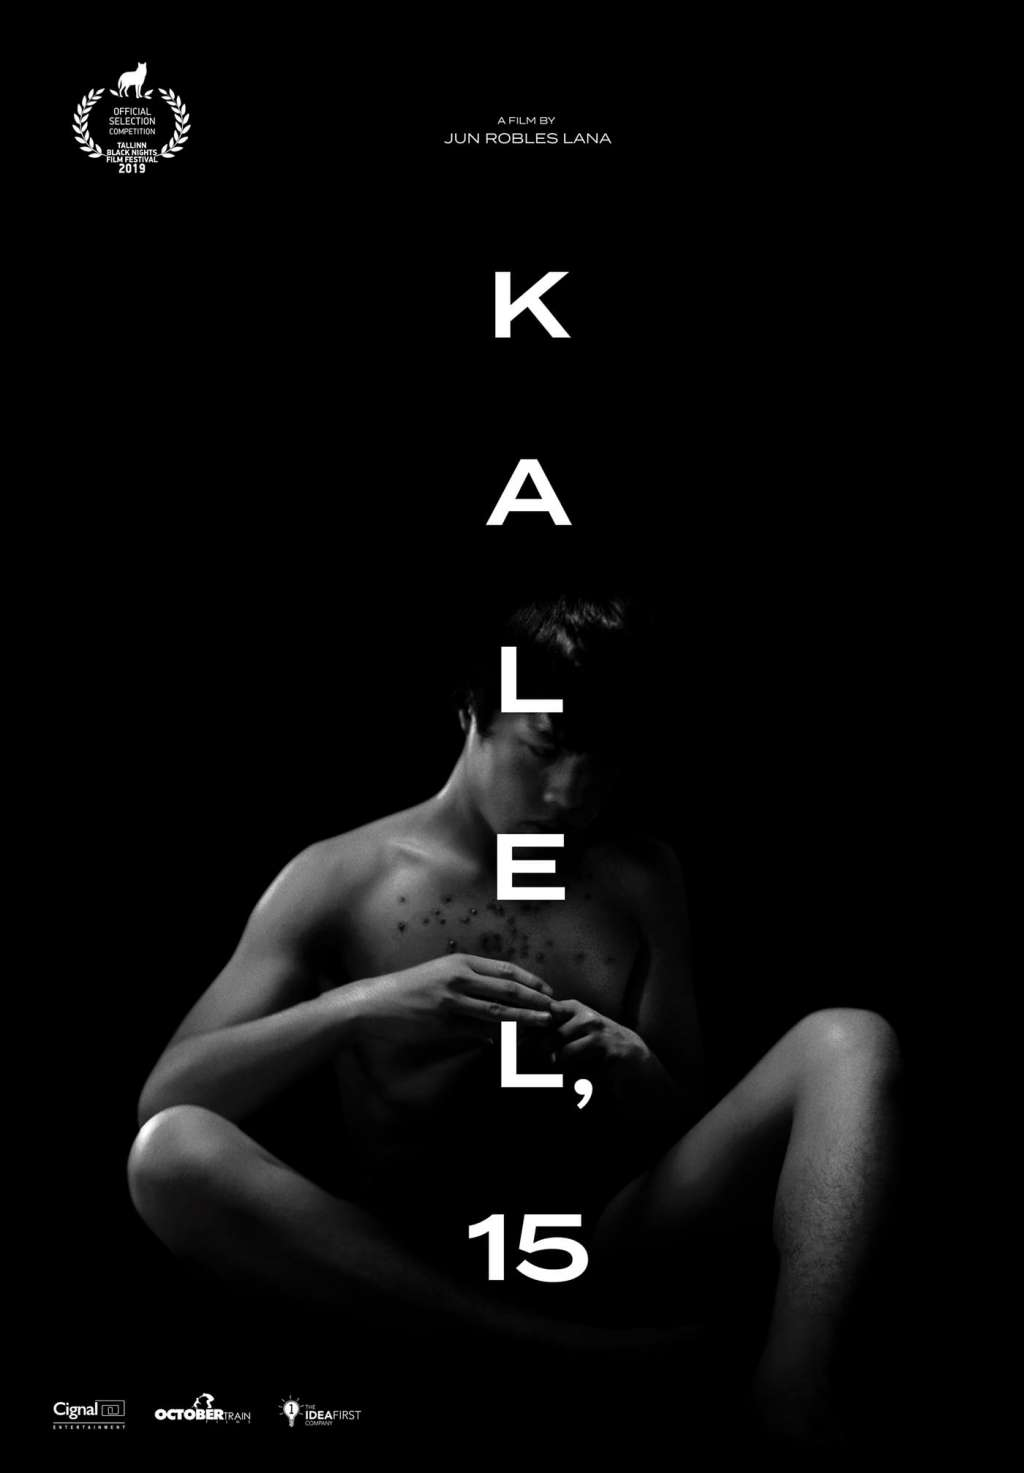 Kalel, 15 kapak